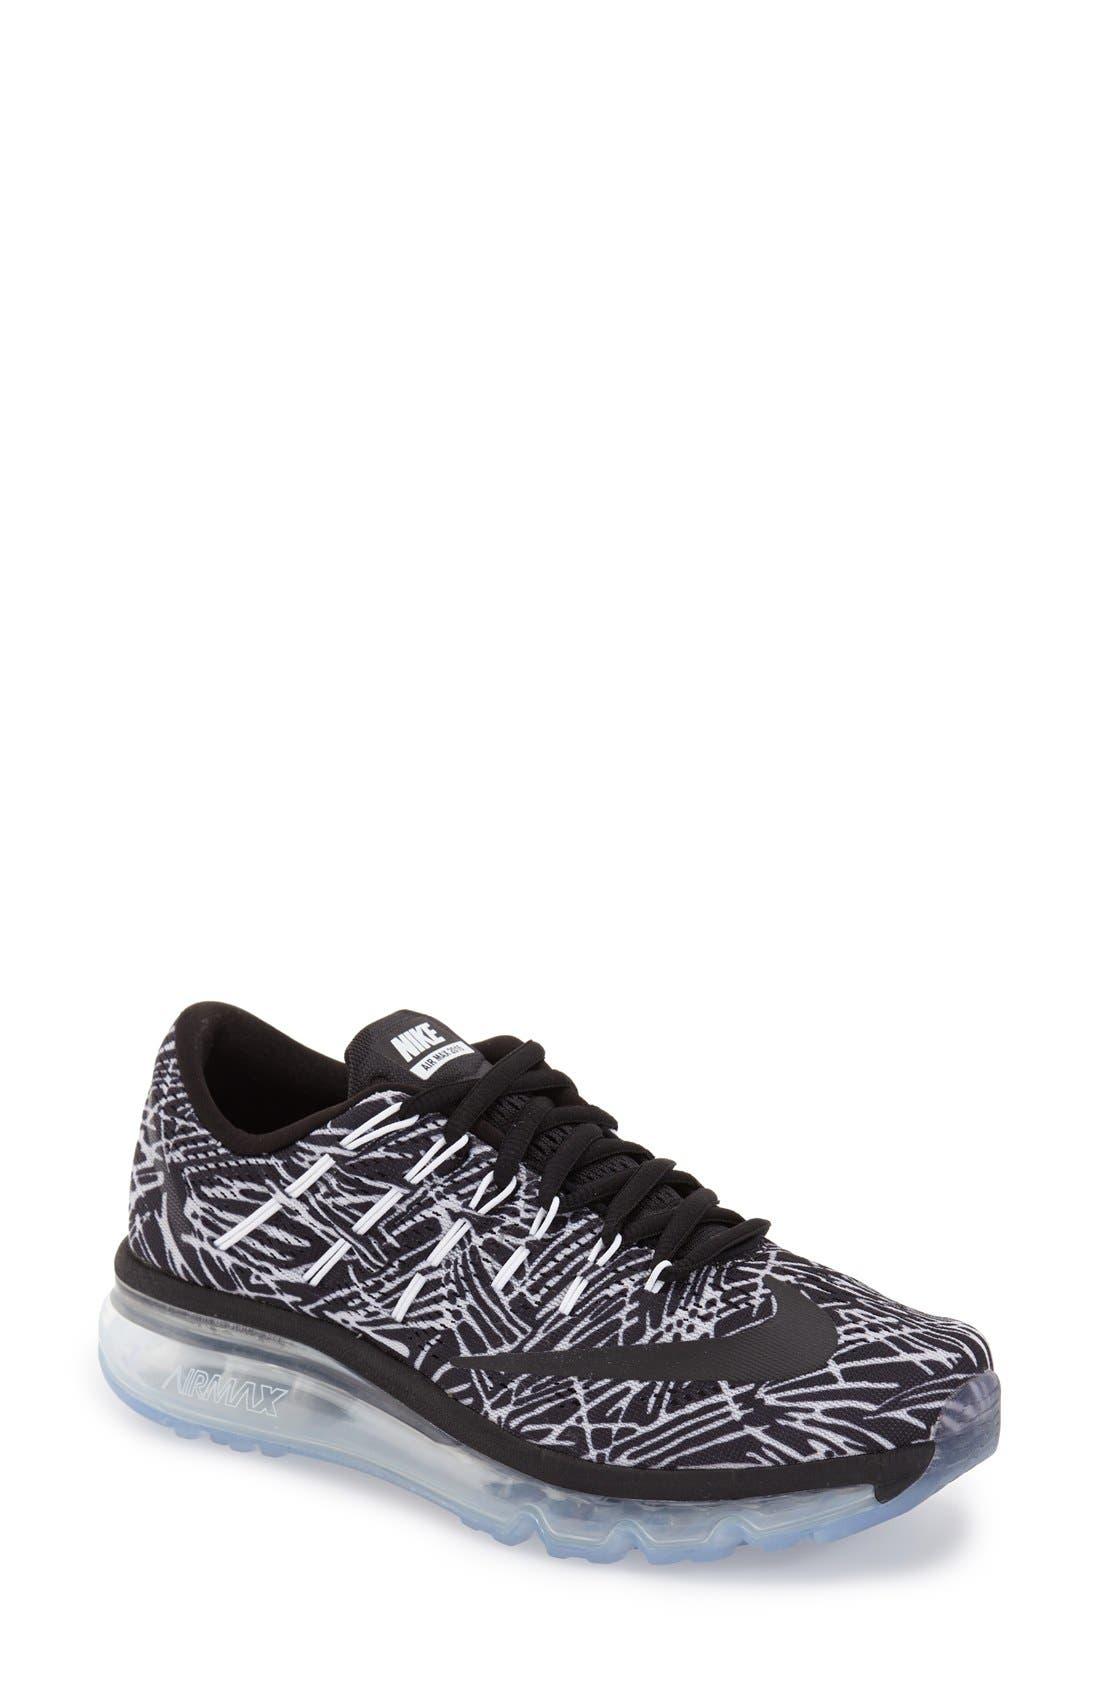 Main Image - Nike 'Air Max 2016' Running Shoe (Women)